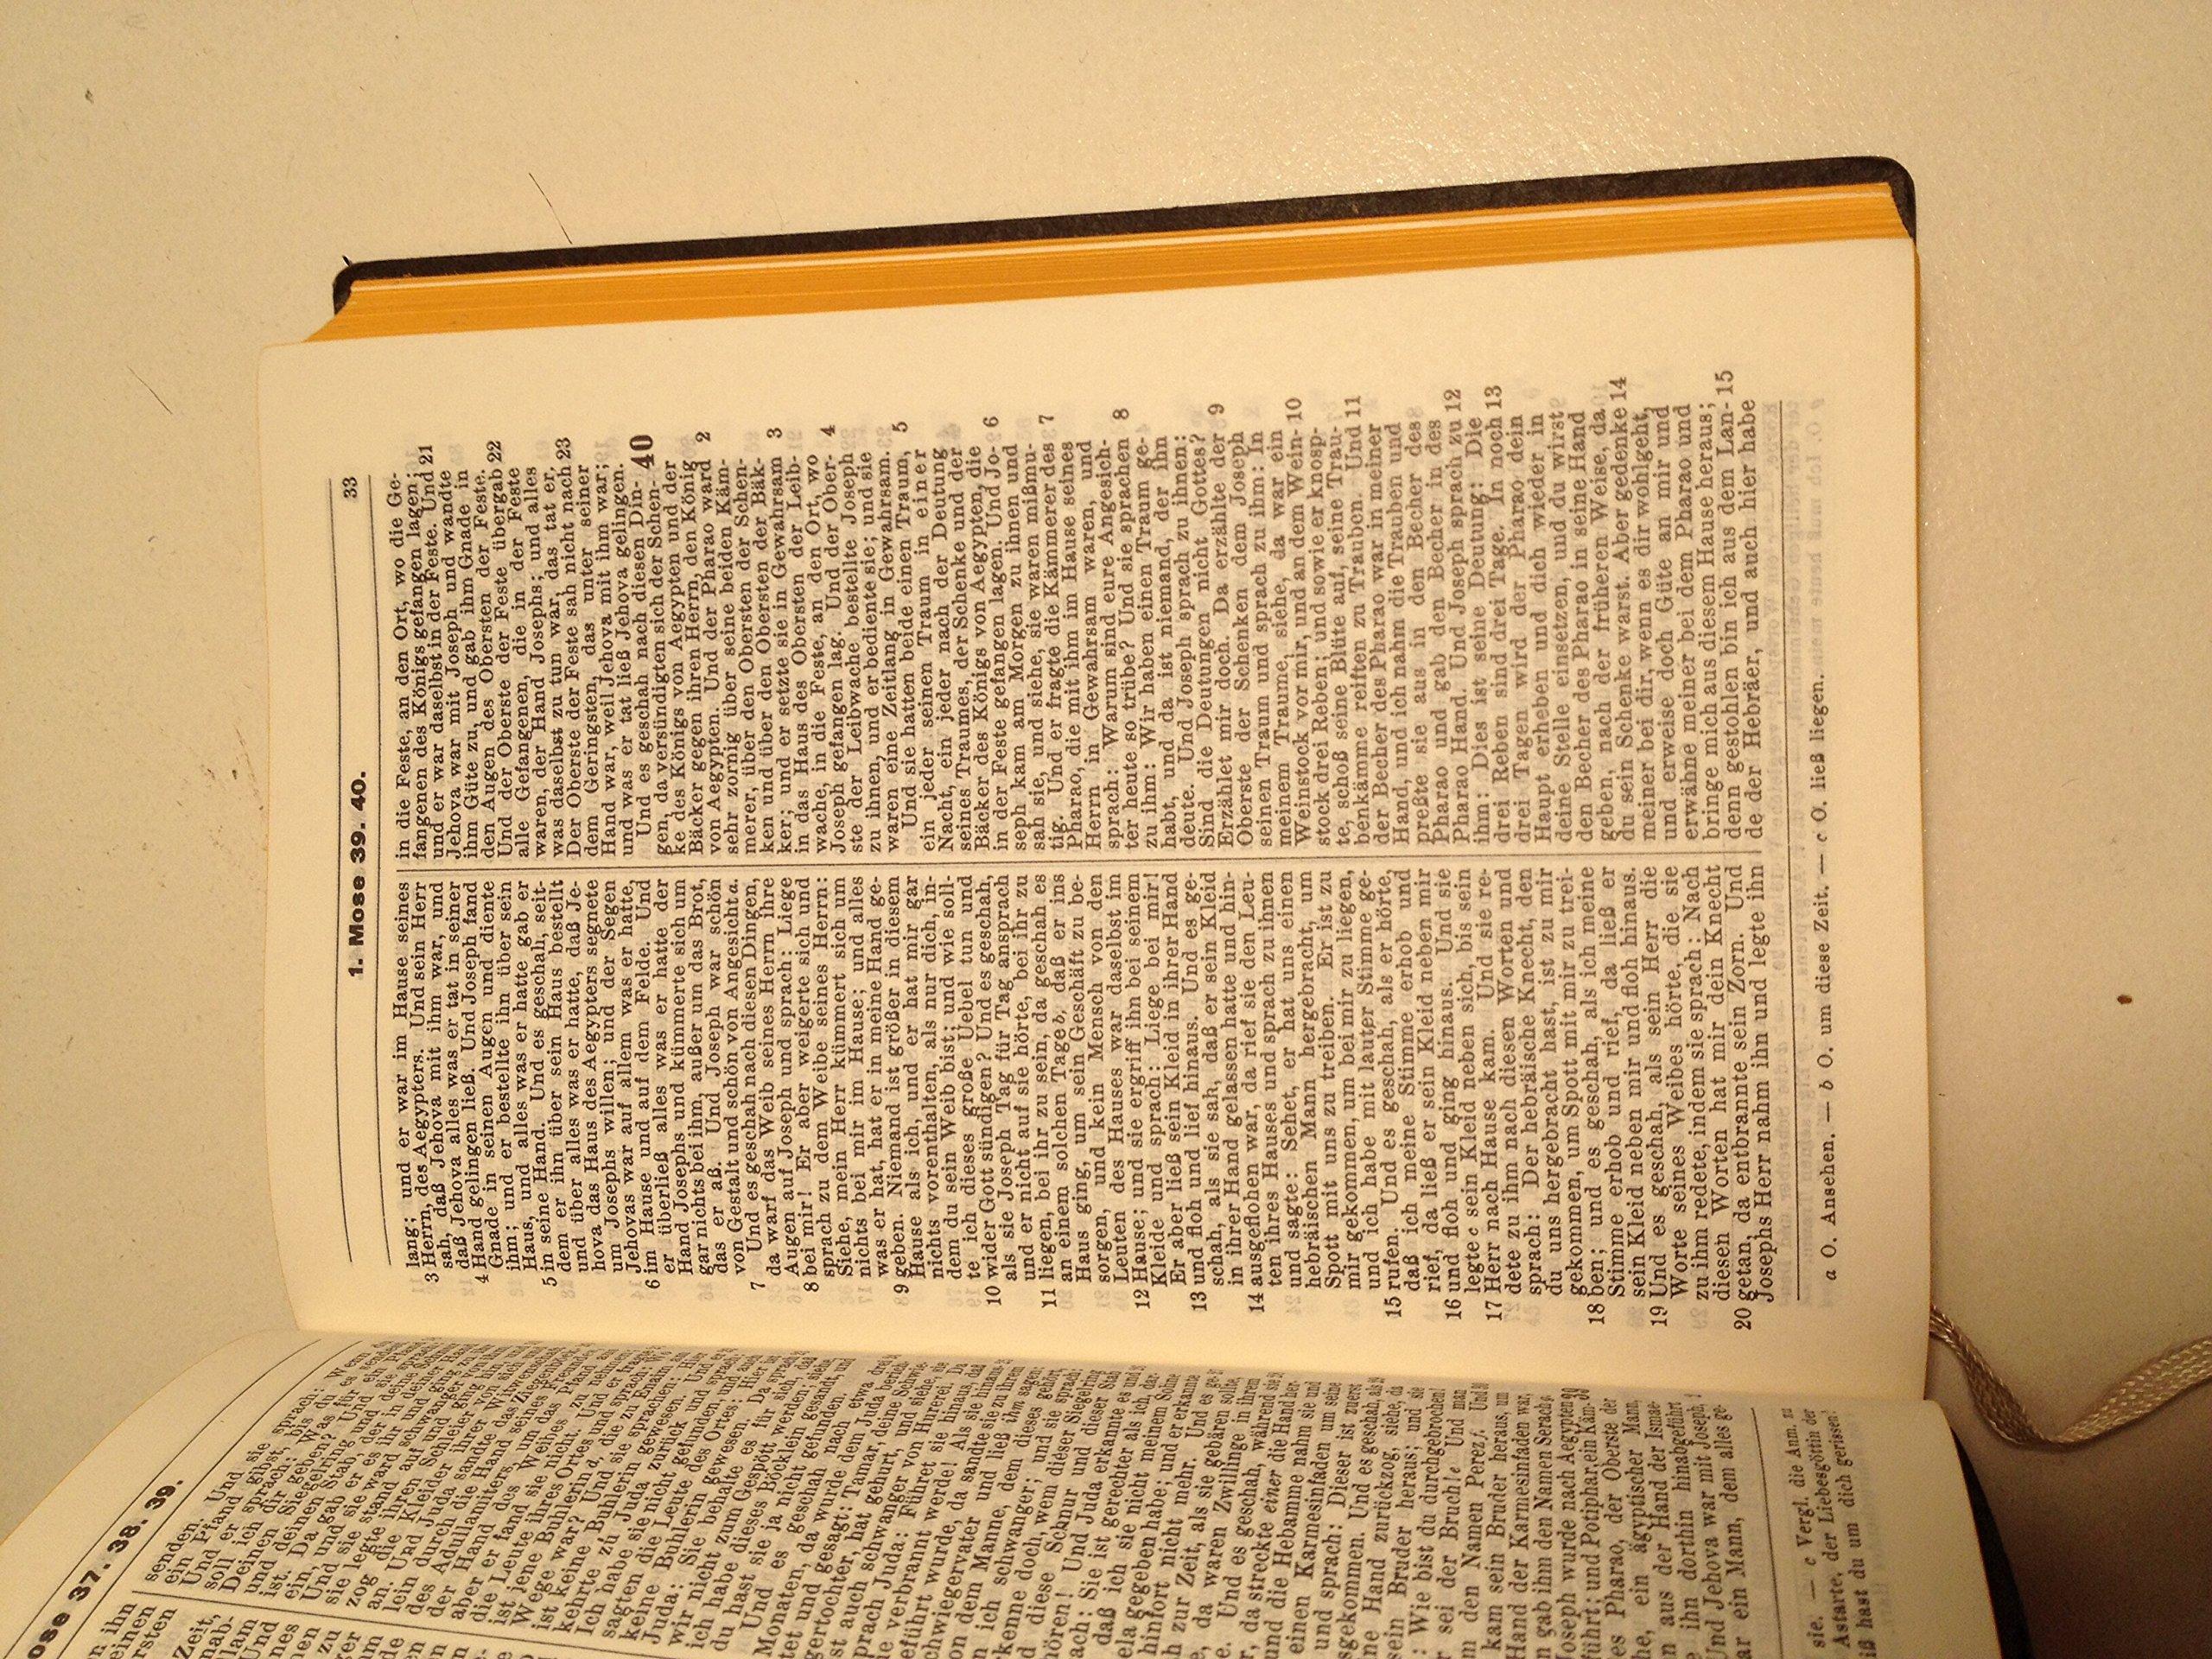 ELBERFELDER BIBEL UNREVIDIERT EPUB DOWNLOAD